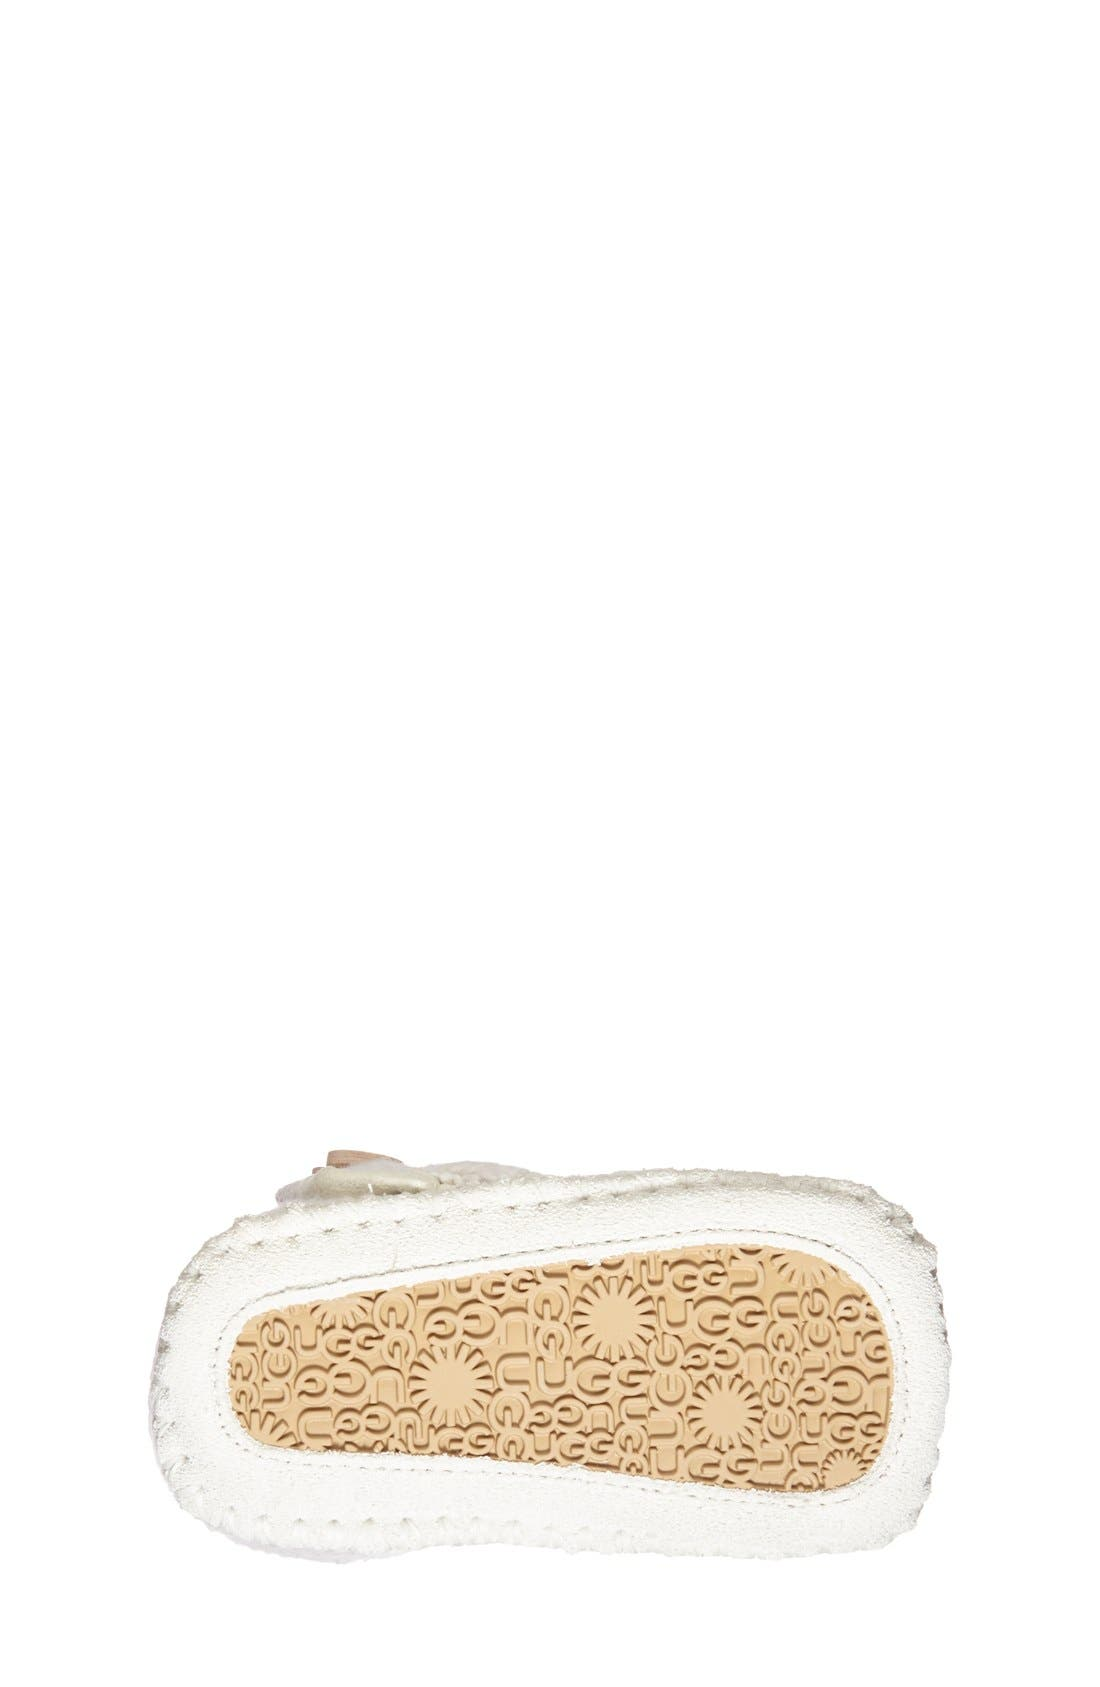 Purl Knit Bootie,                             Alternate thumbnail 2, color,                             924